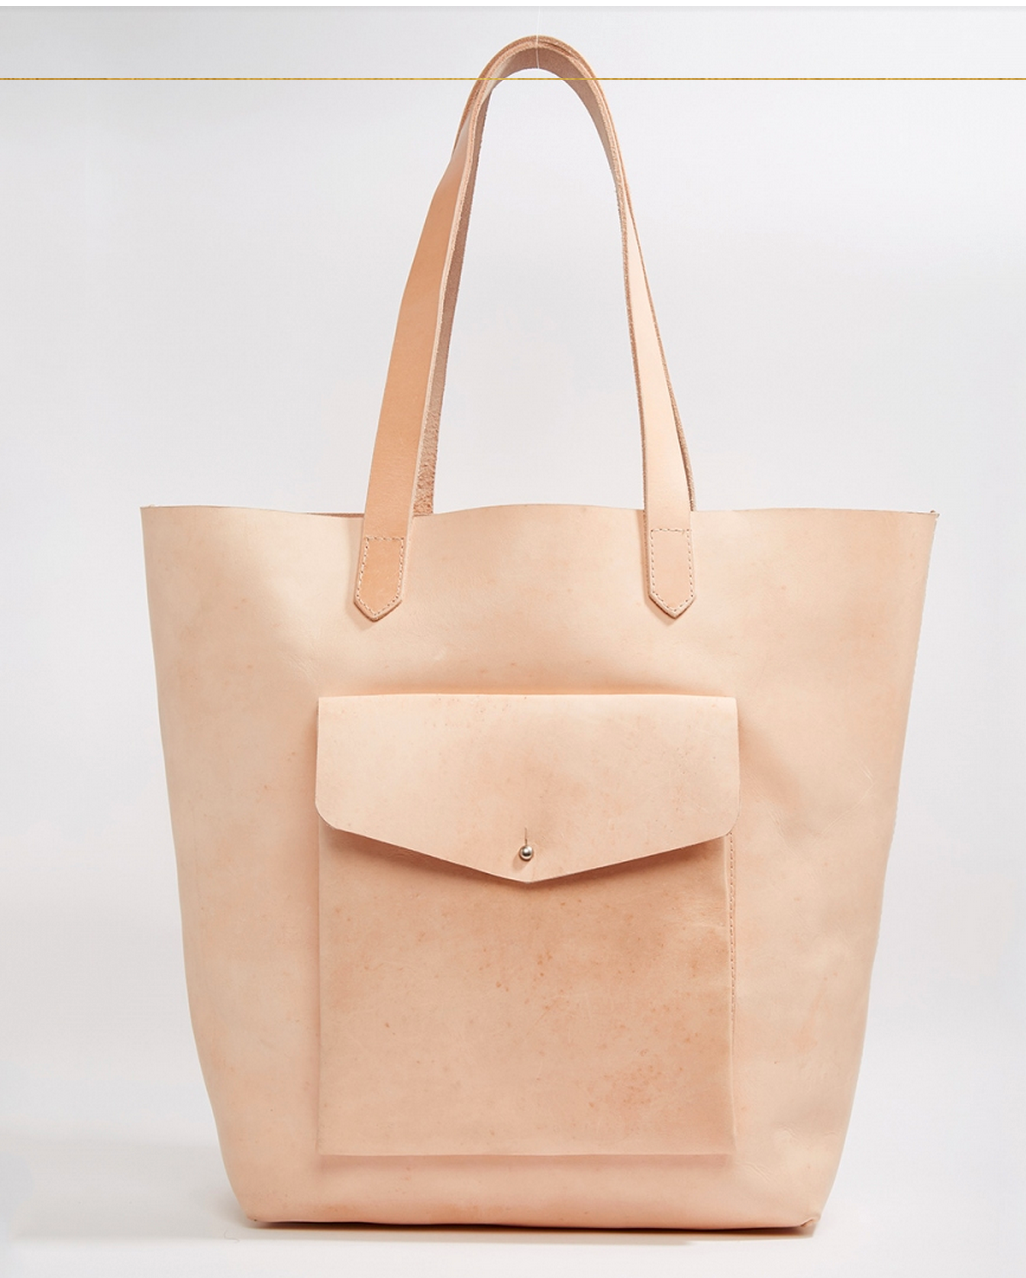 Beautiful day bag by Cocodune.